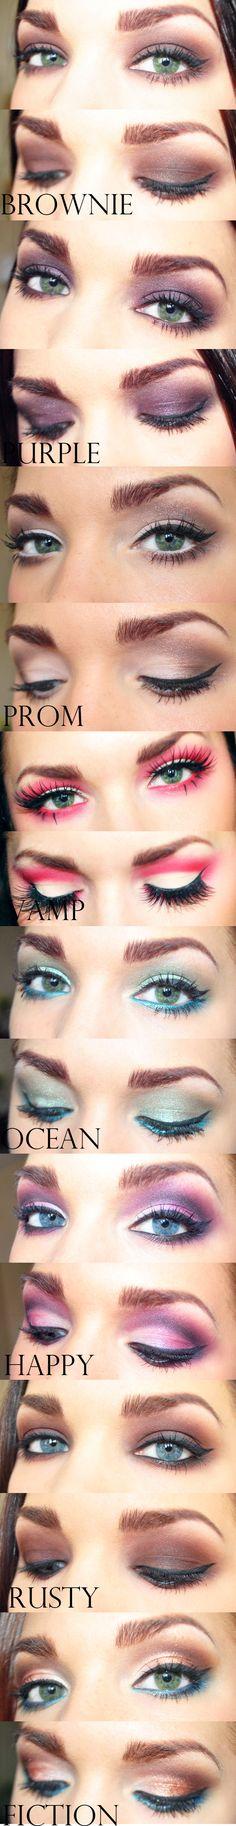 great eye make up!